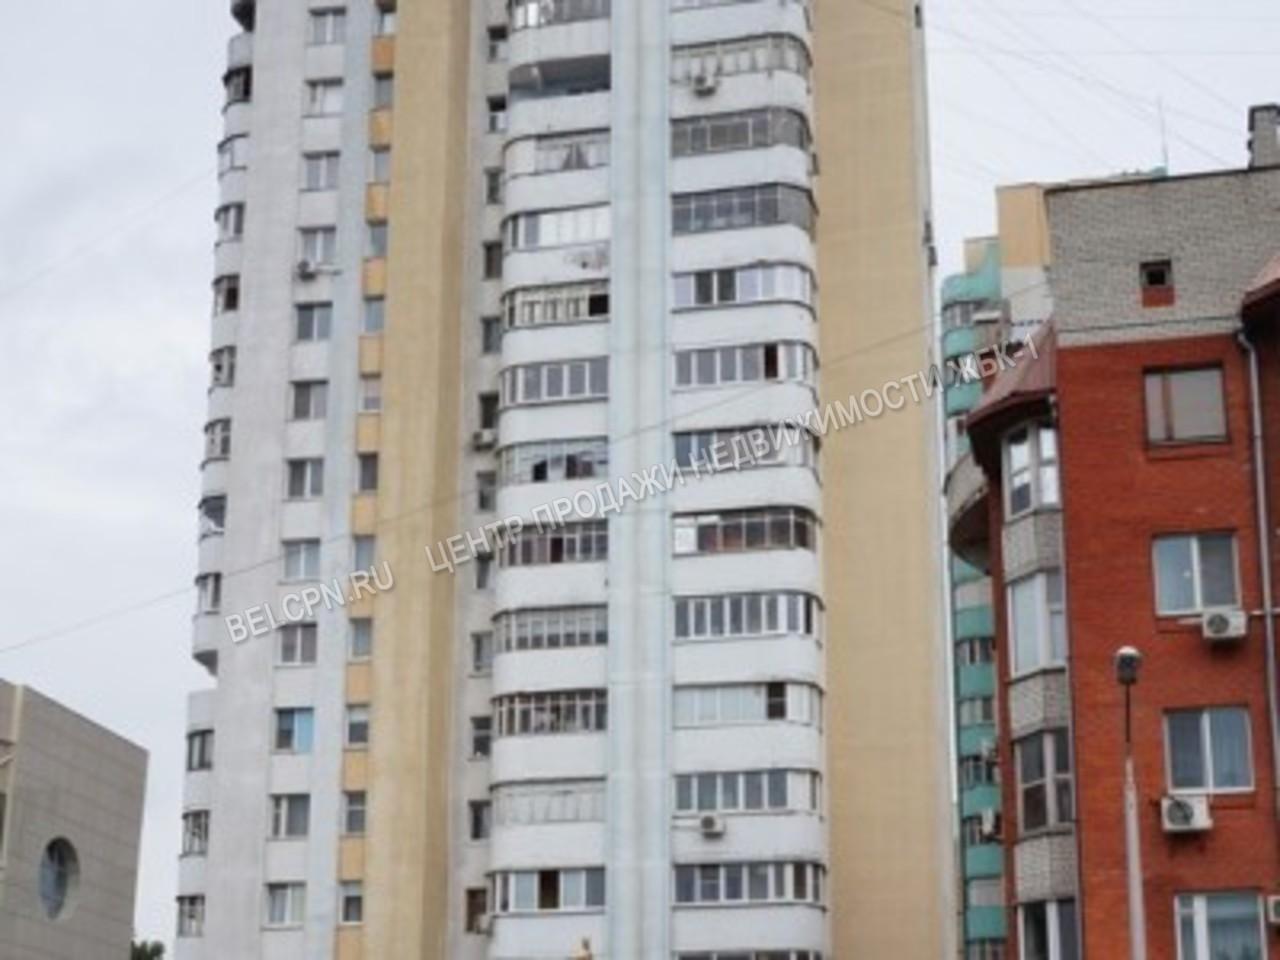 kvartira-belgorod-ulica-nikolaya-chumichova-208839459-1